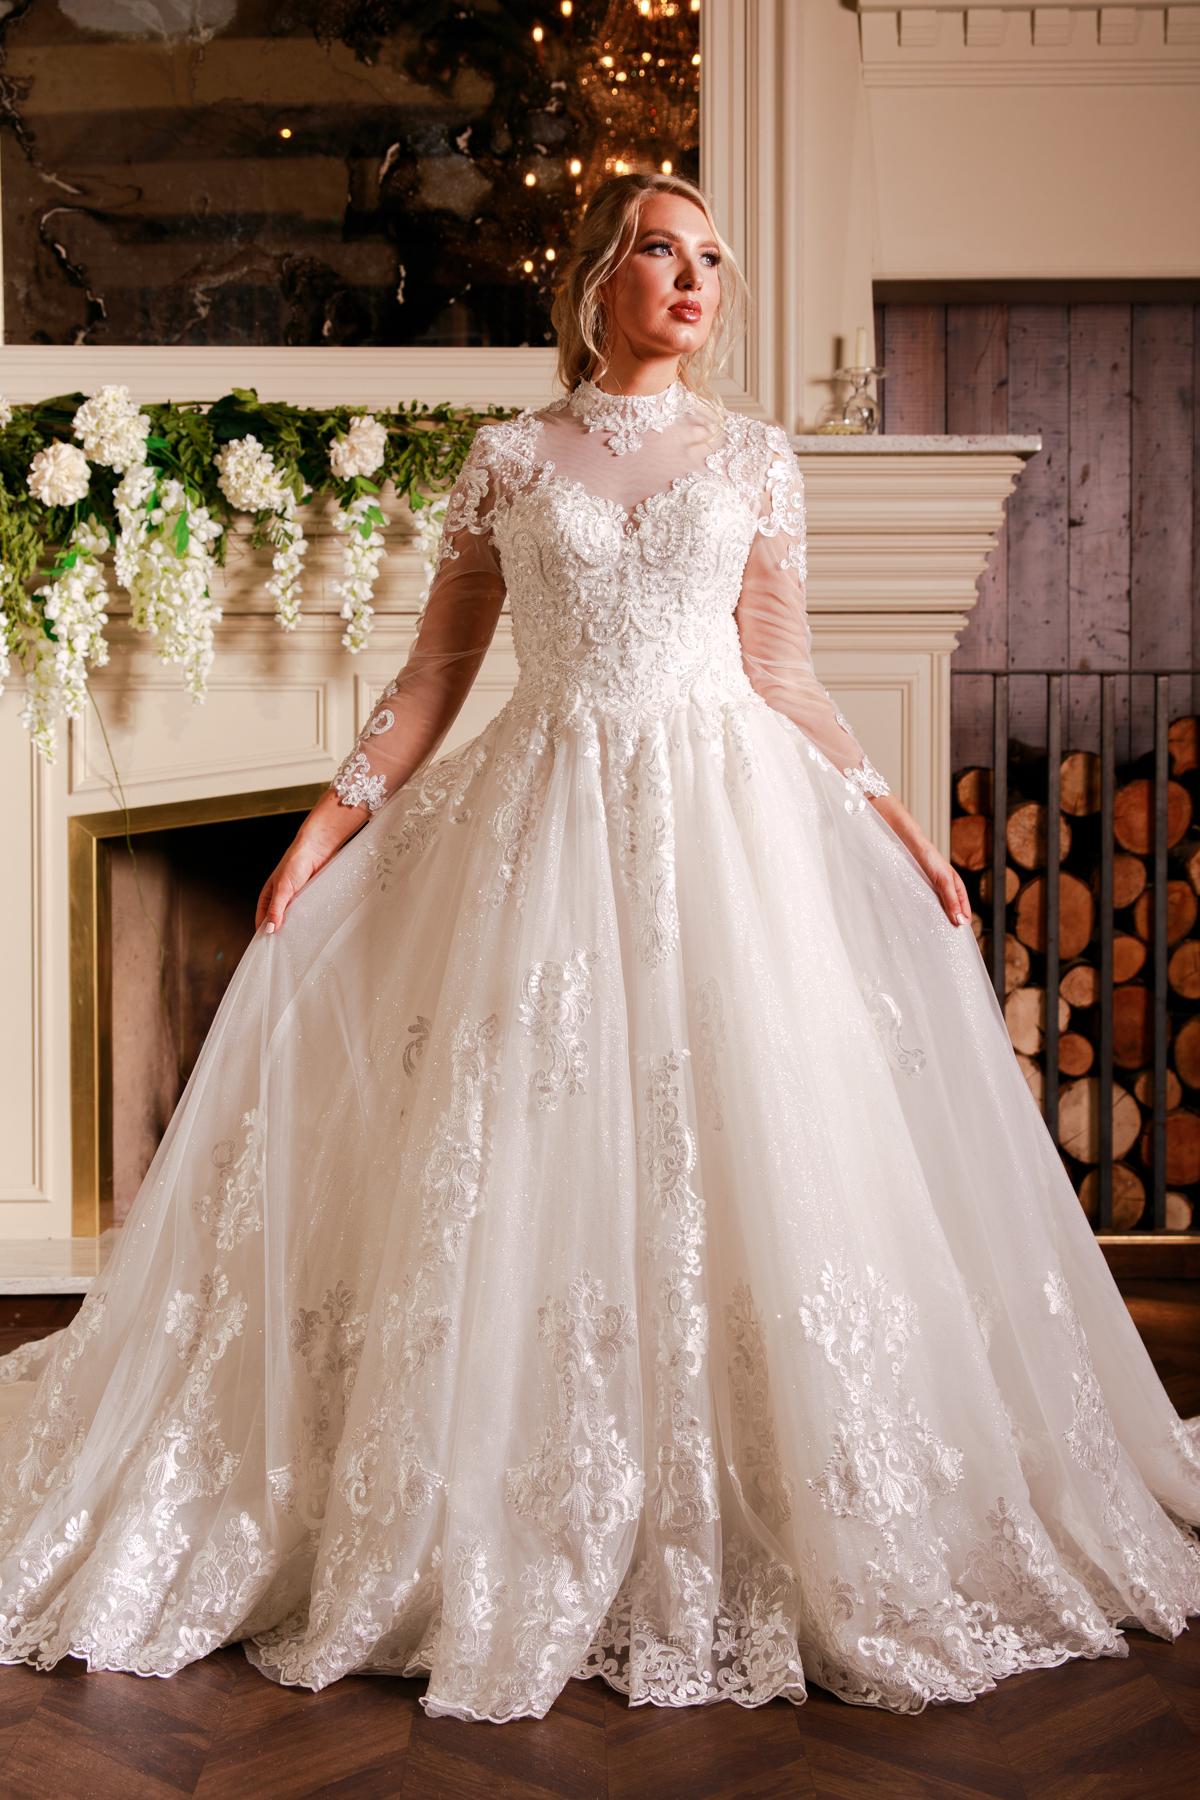 W310-Victoria-Kay-Designer-WJ-Dress-Finder